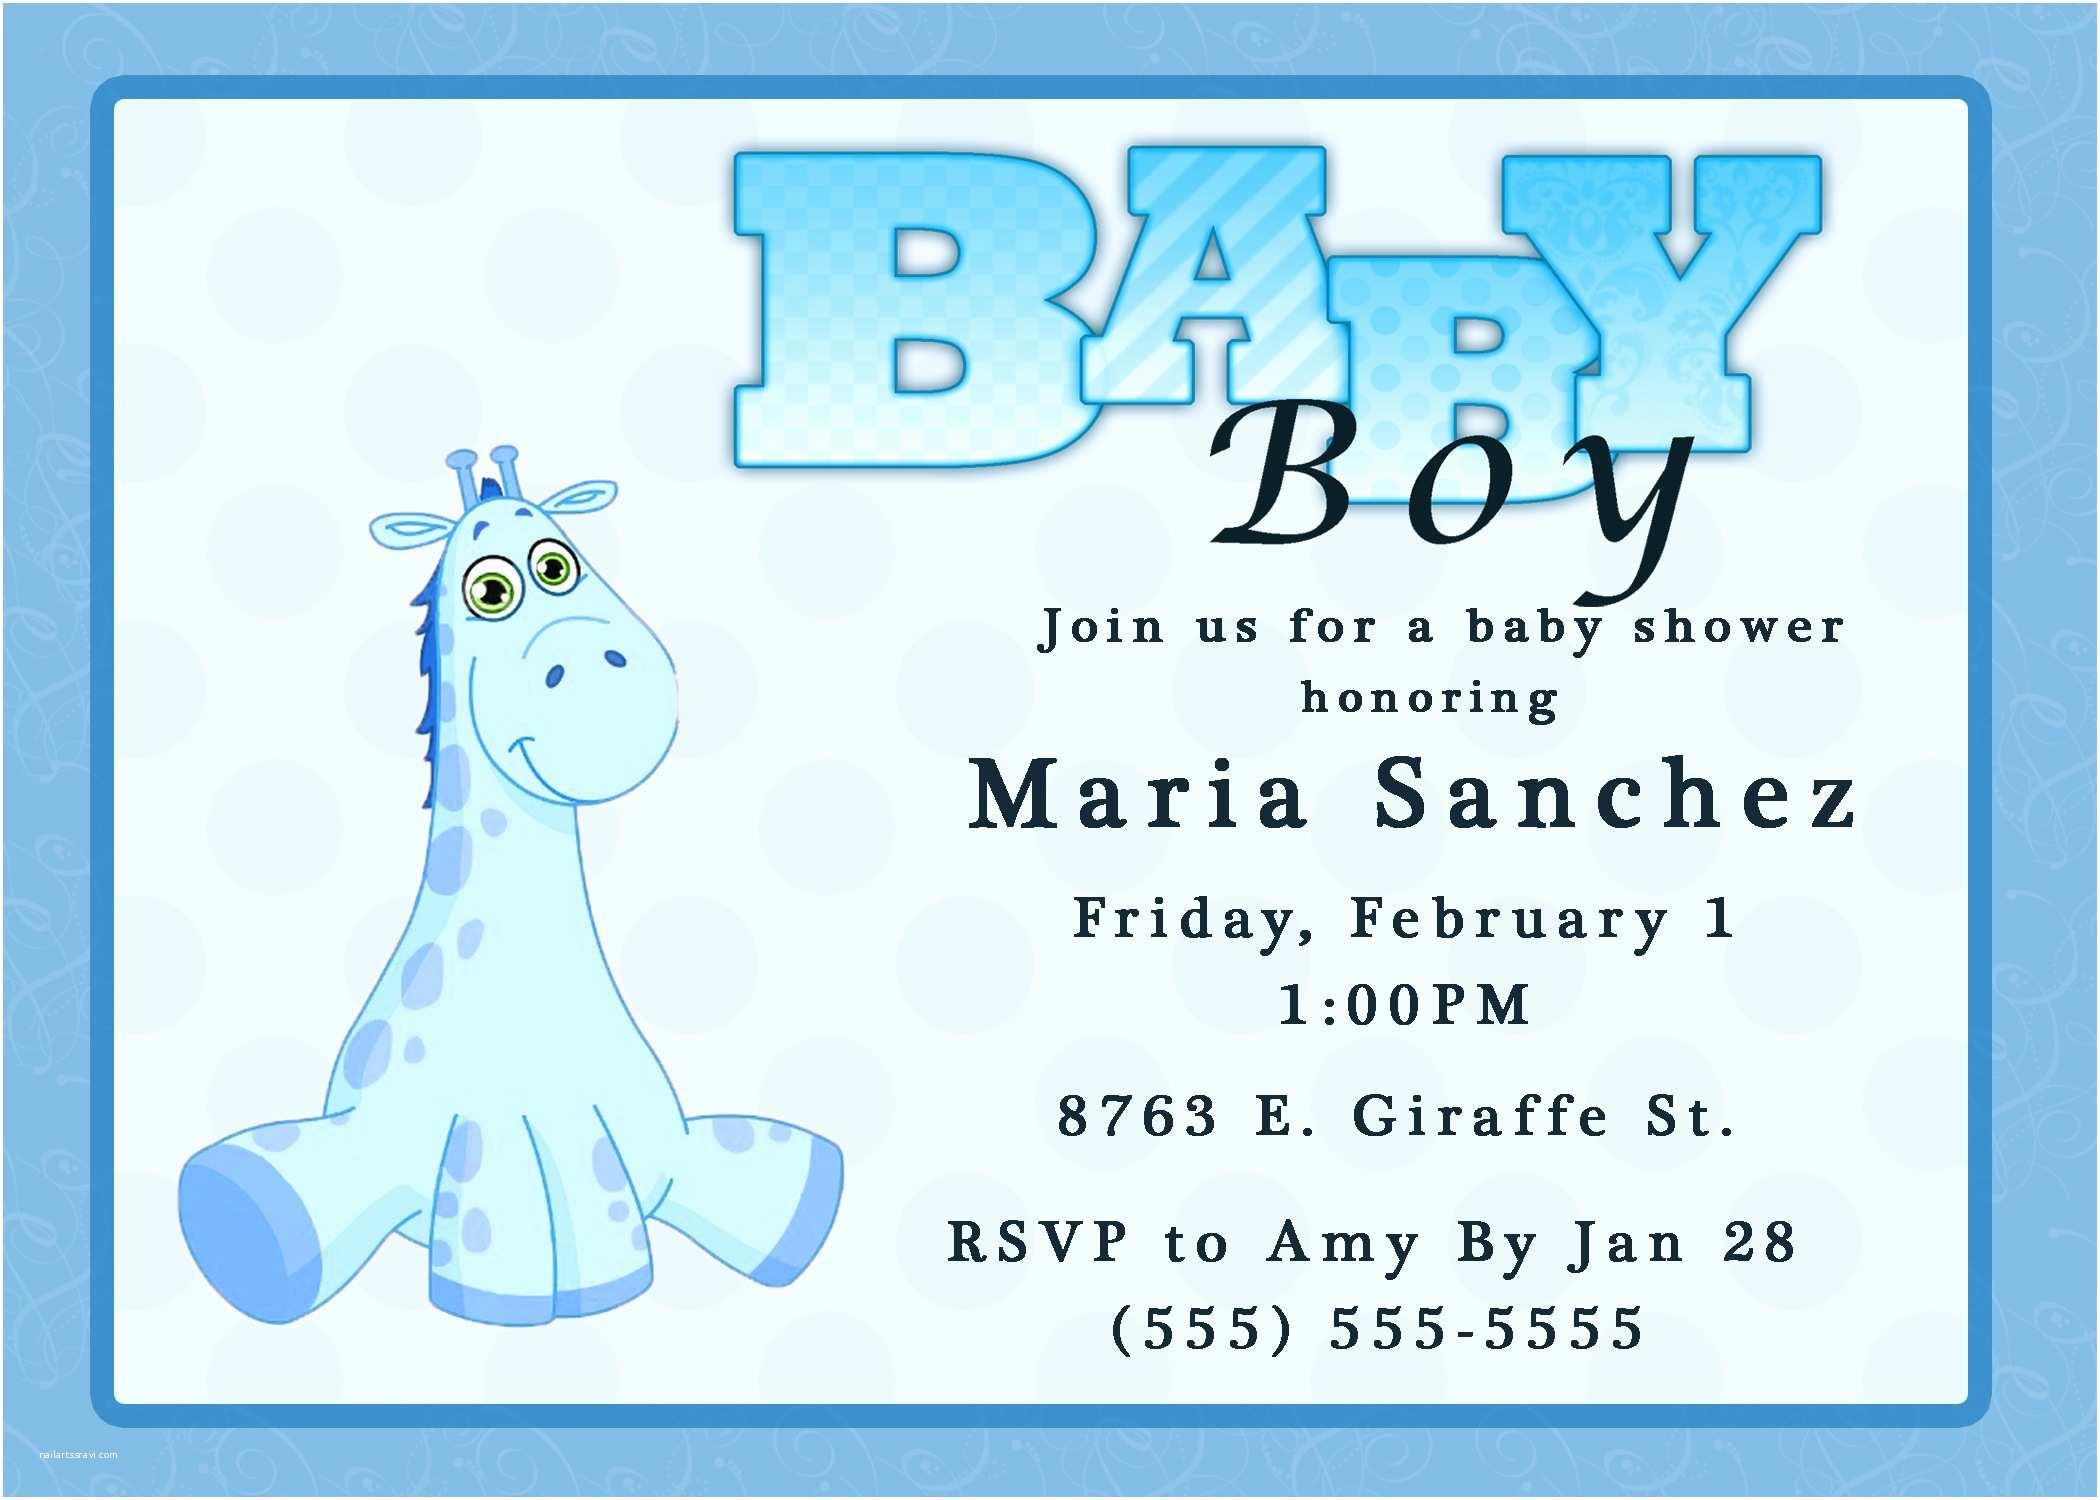 Baby  Shower Invitation Wording Free Baby  Shower Invitations Templates Baby